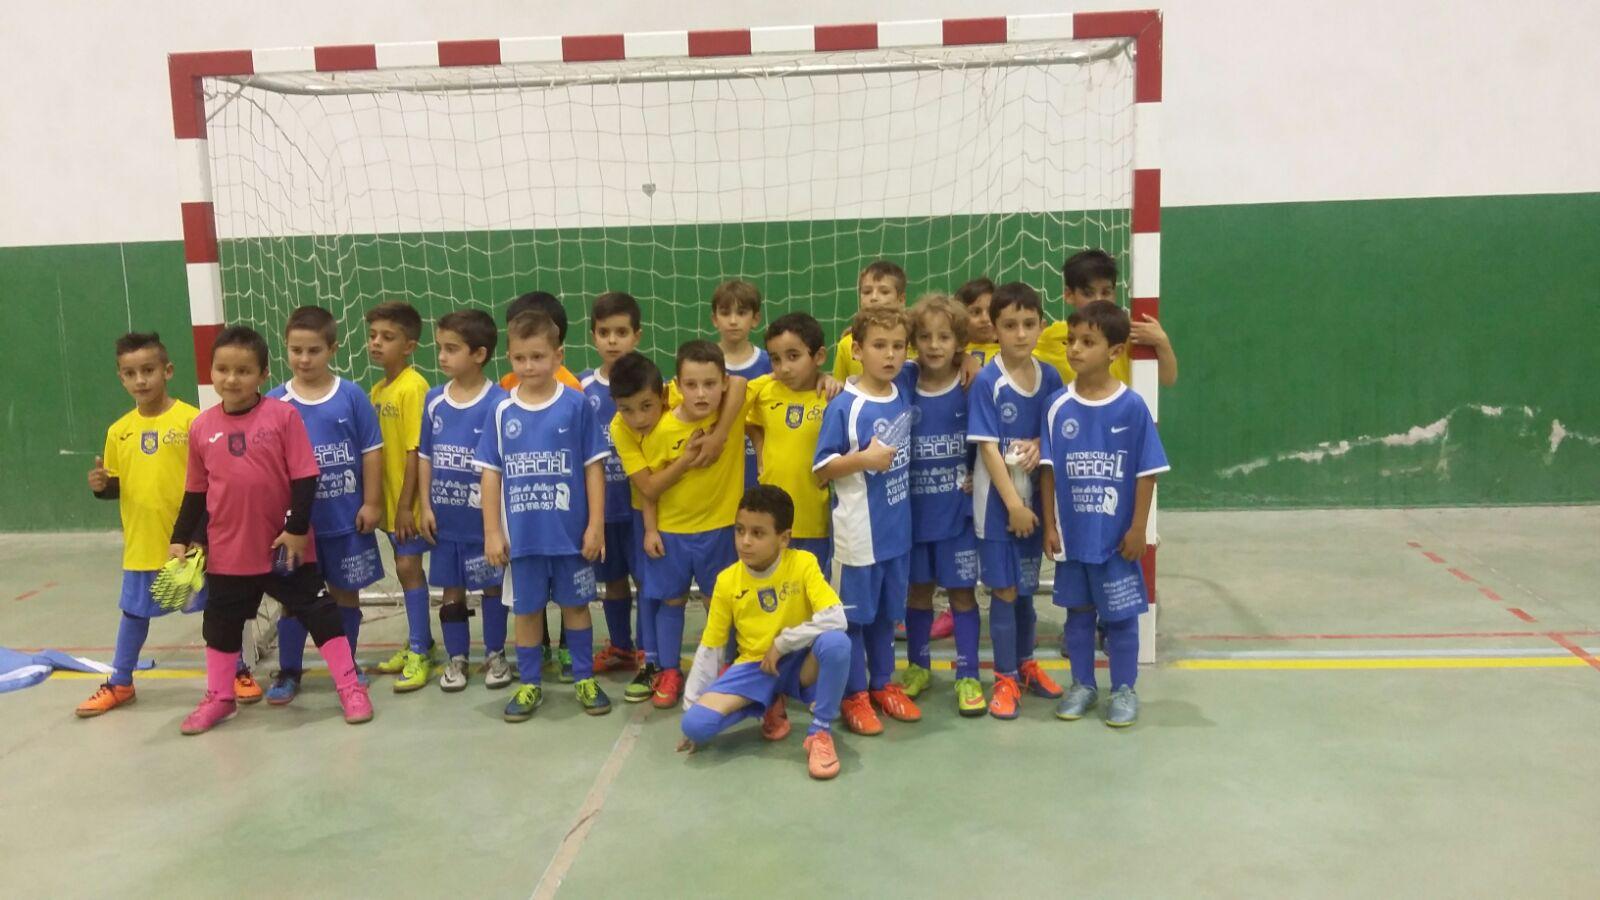 01 Fútbol Sala – C. F. Jaraíz – Imágenes de Archivo